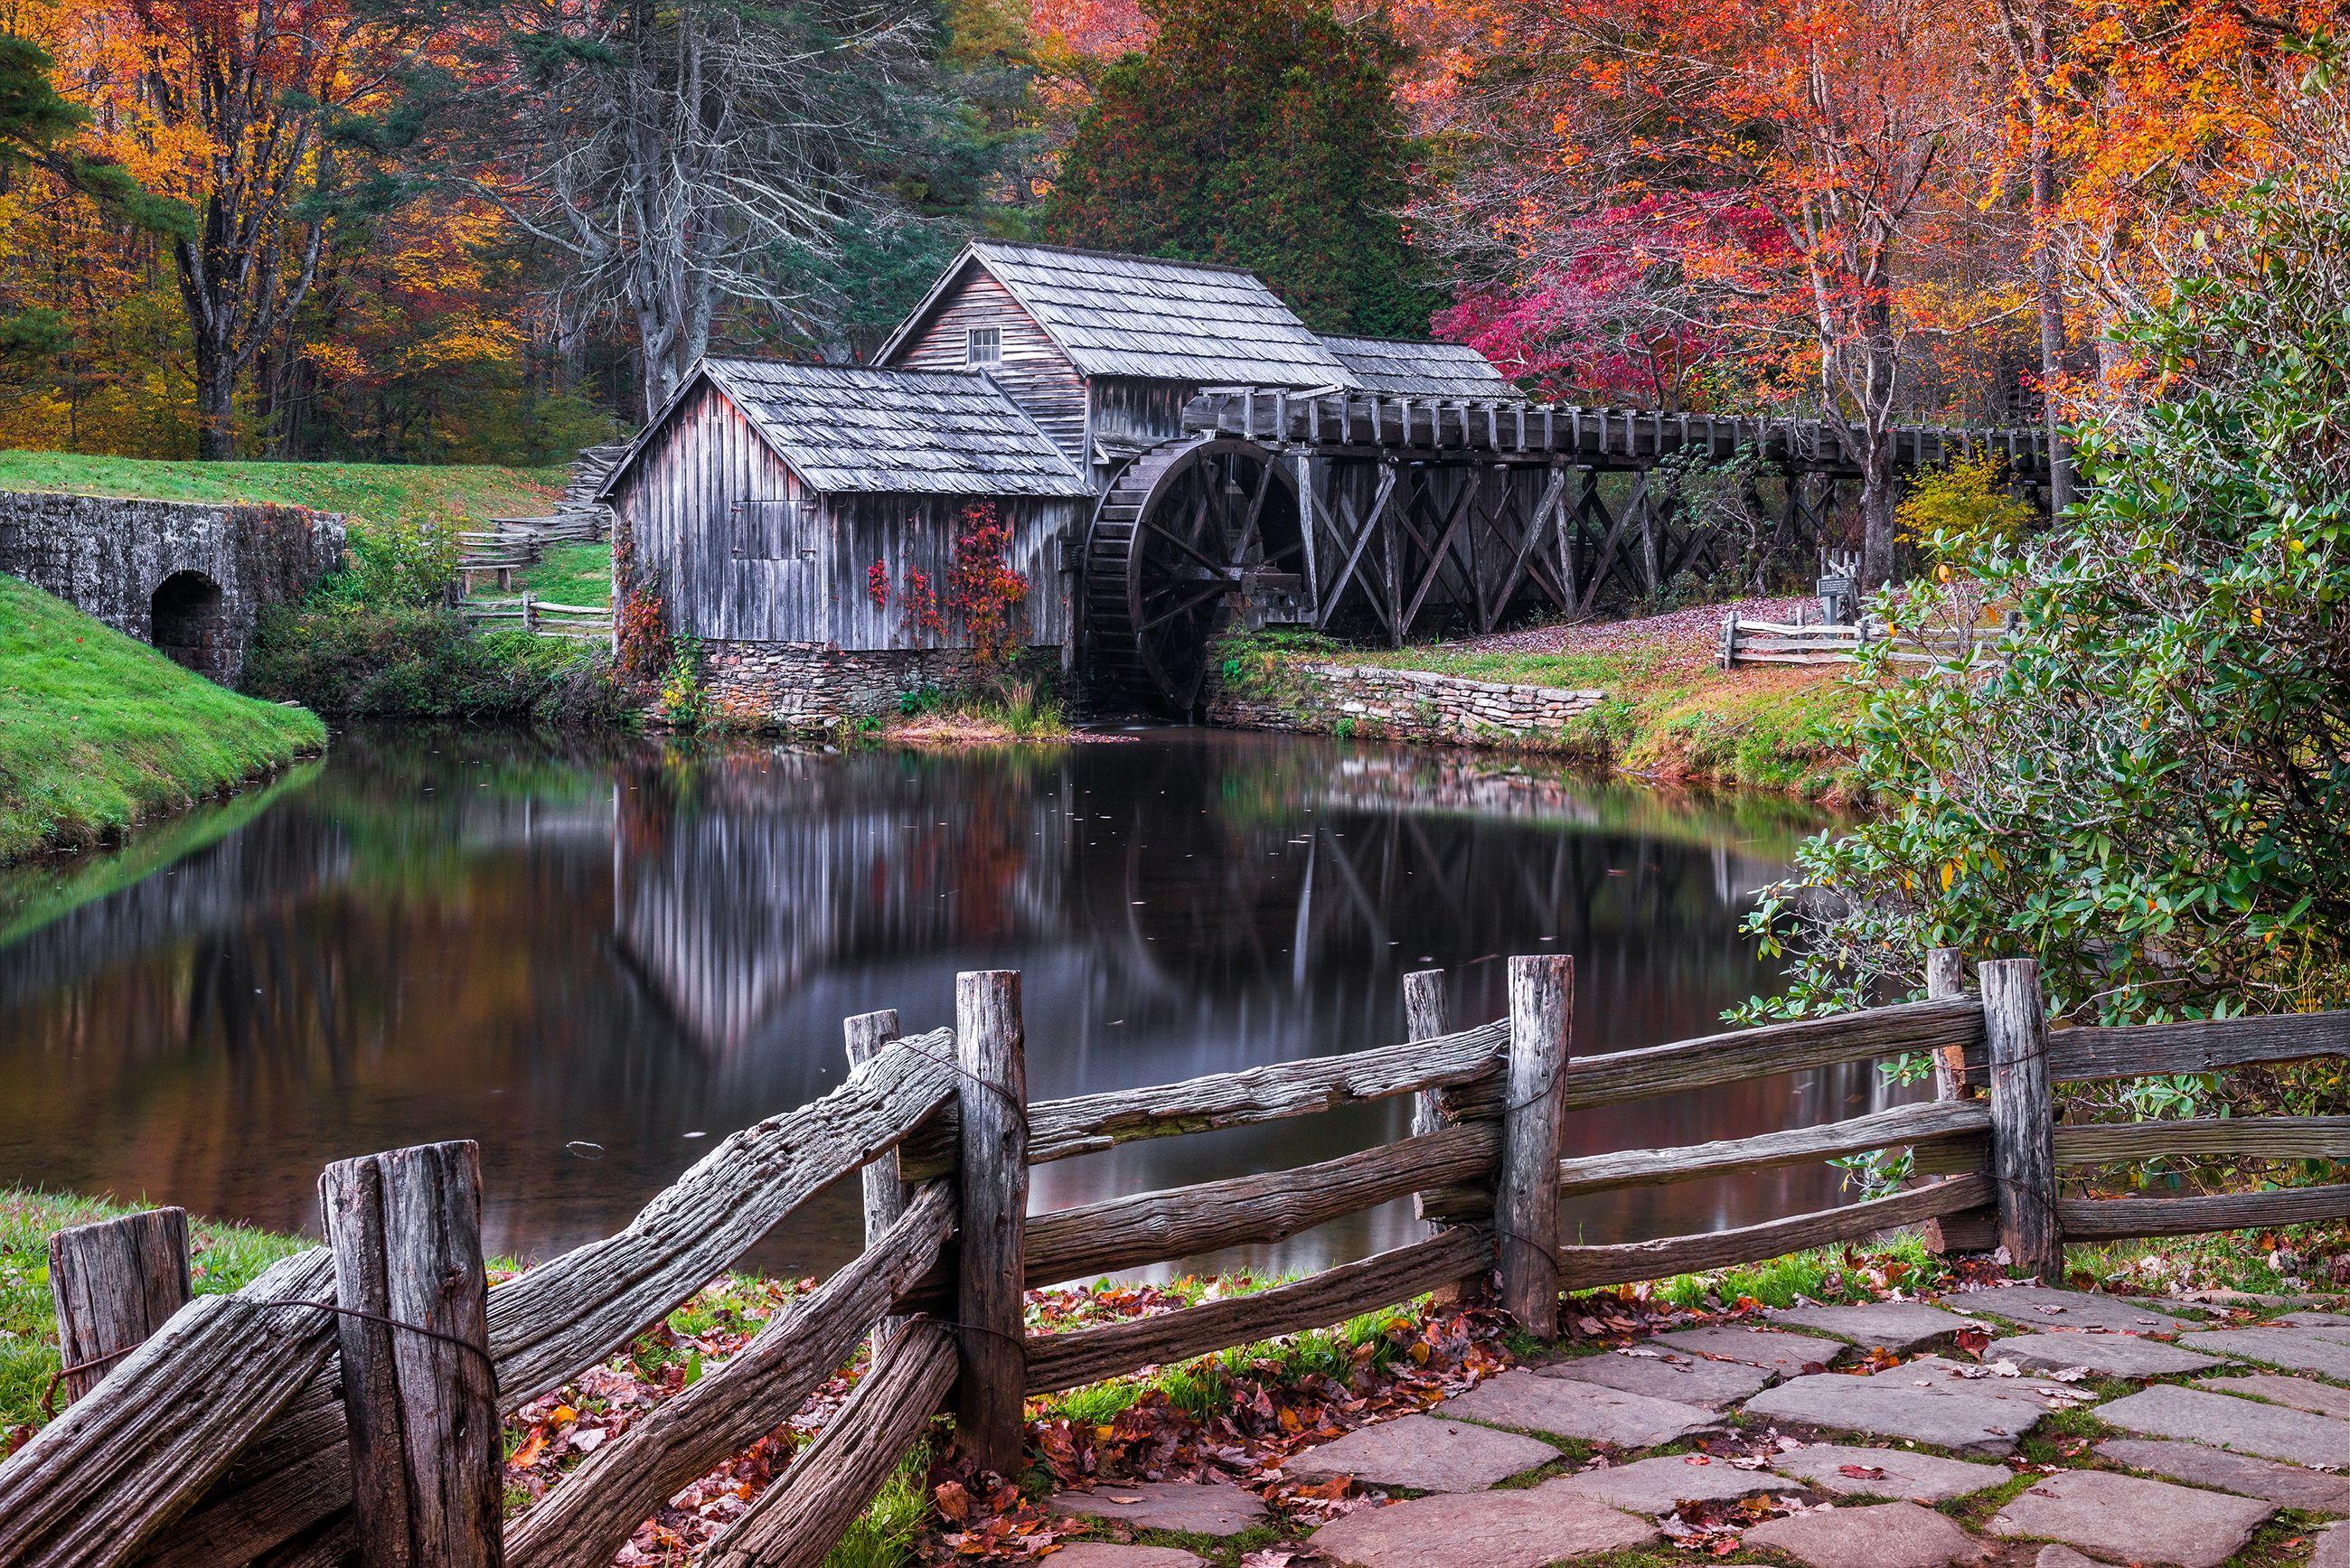 Scenic grist mill, fall foliage